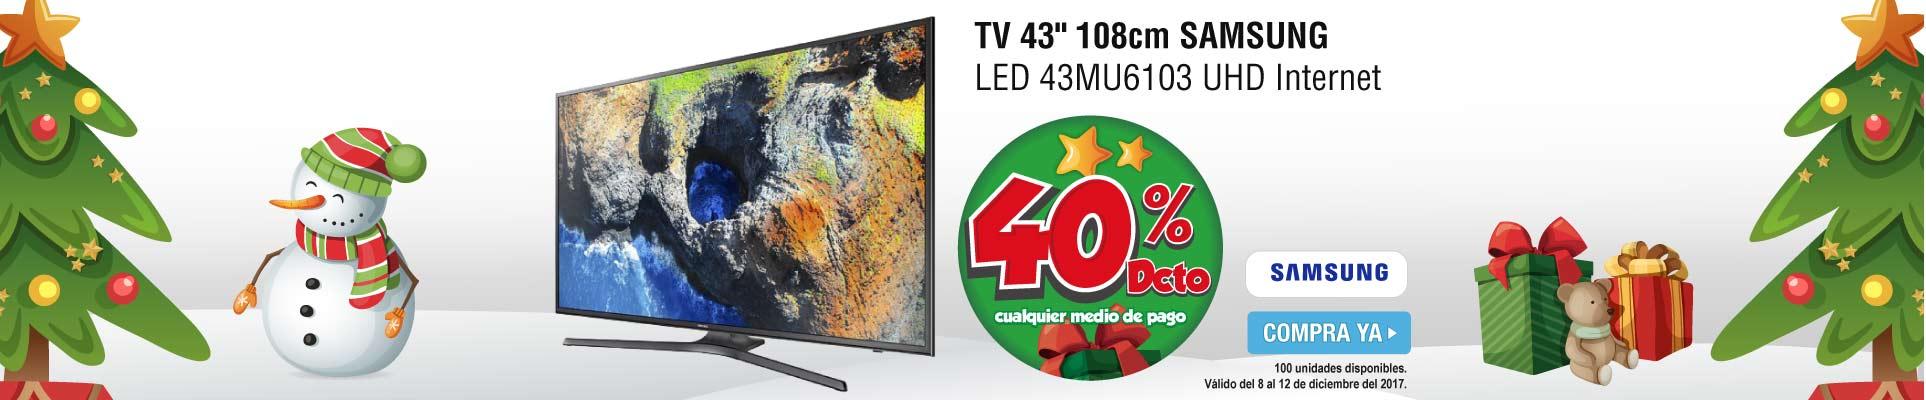 PPAL ALKP-2-tv-TV 43 108cm SAMSUNG LED 43MU6103 UHD Internet-prod-diciembre8-12